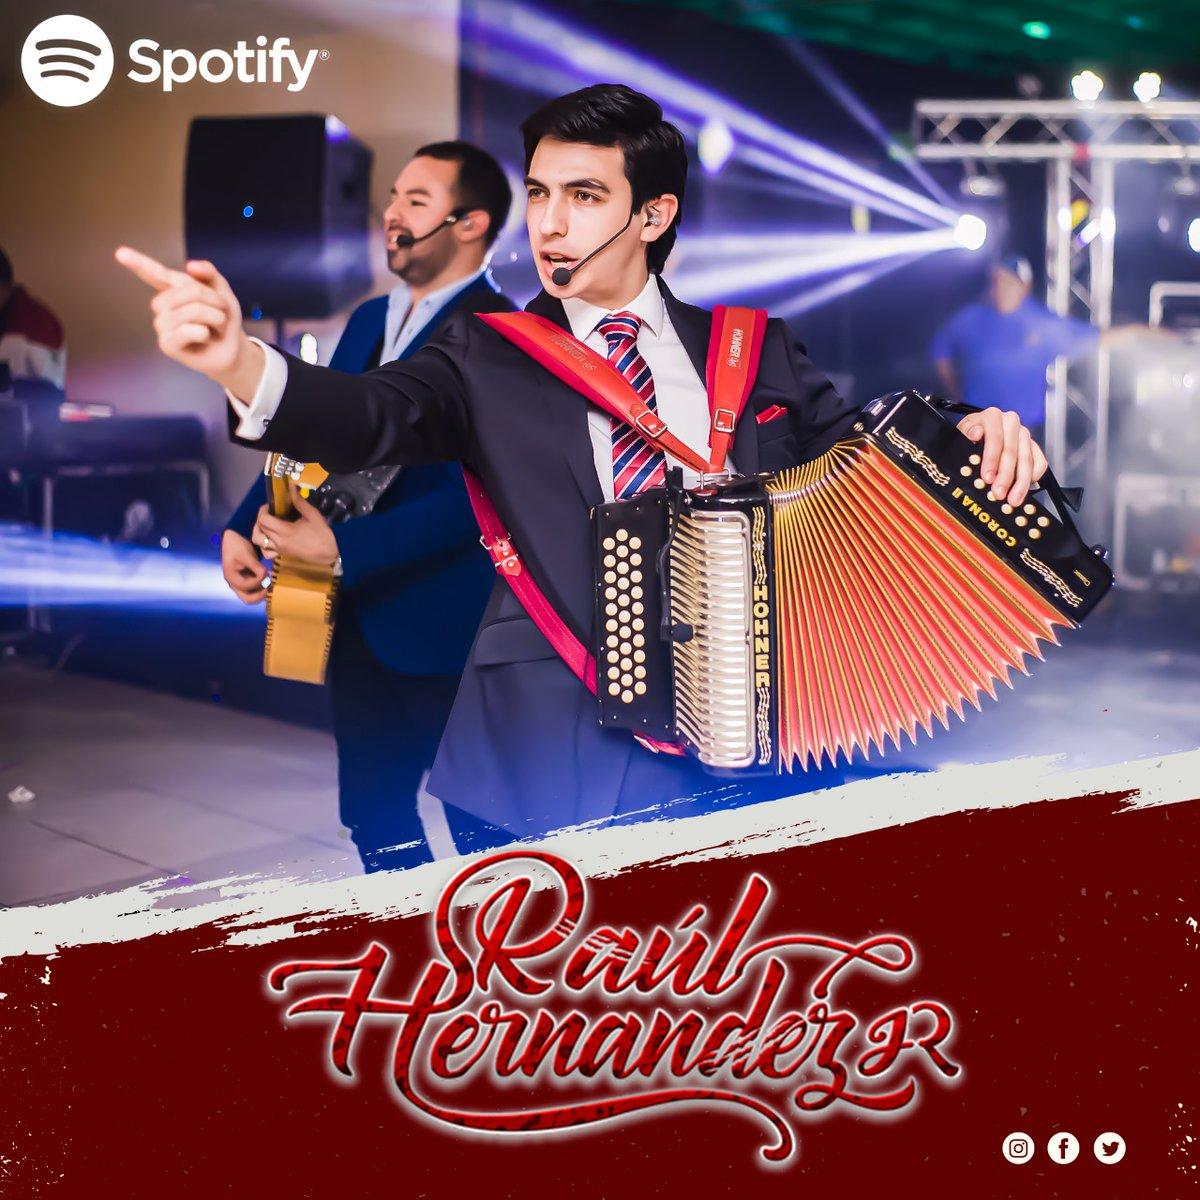 ¡Toda la música de @RaulHernandez96 en un solo lugar! ▶️ https://t.co/M0xh94ZgEG ◀️ Tenemos una SORPRESA para ustedes 💥🎶 Muy pronto ⚠️🙊 https://t.co/qUqa3871Pw